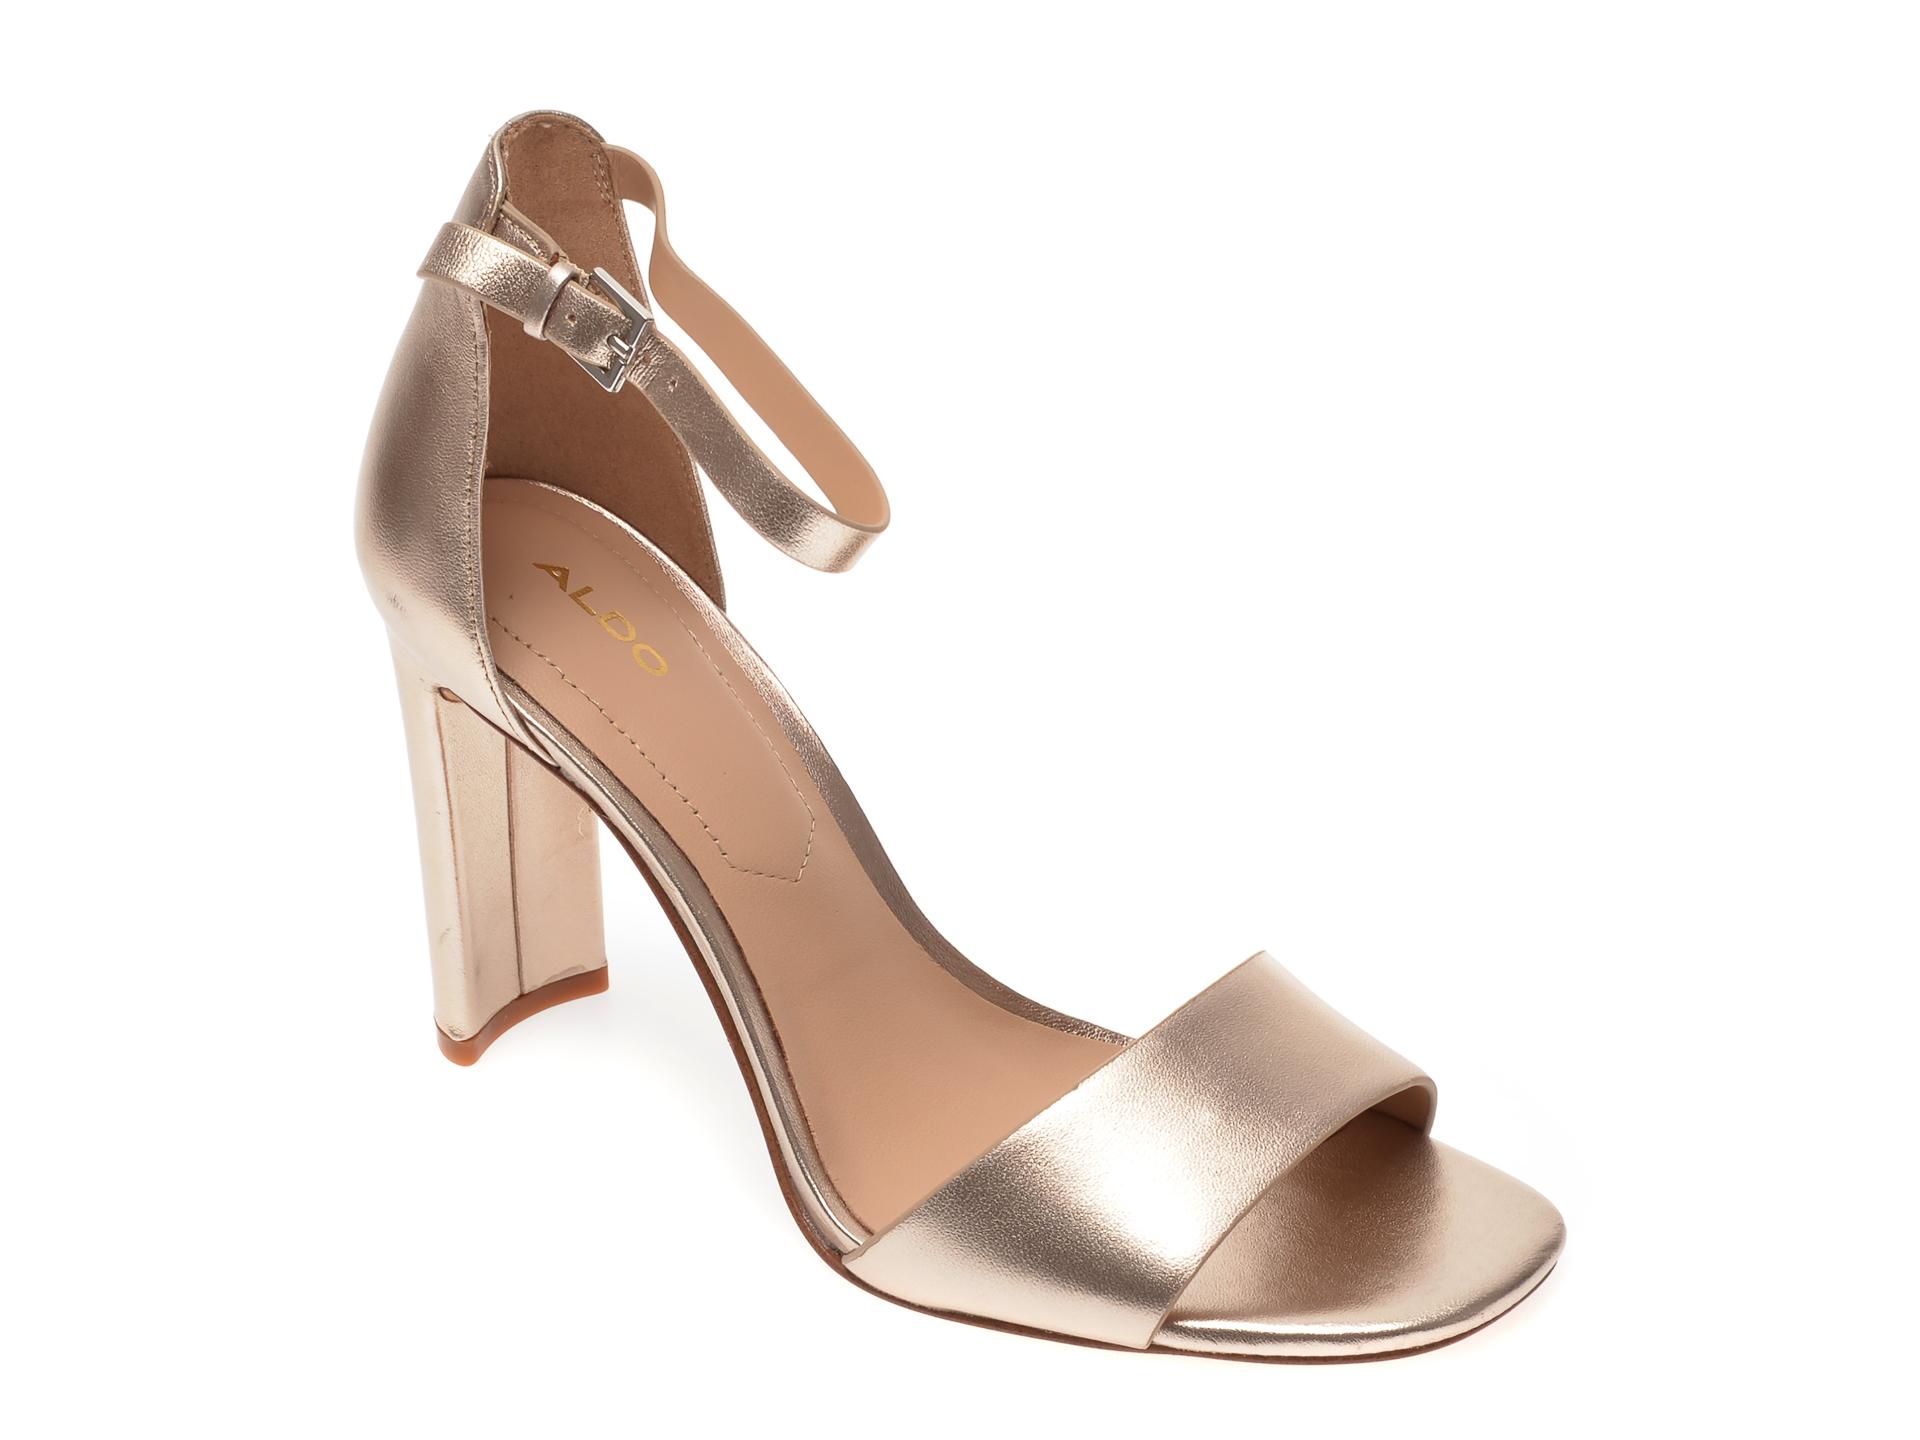 Sandale ALDO aurii, Jeremy041, din piele naturala